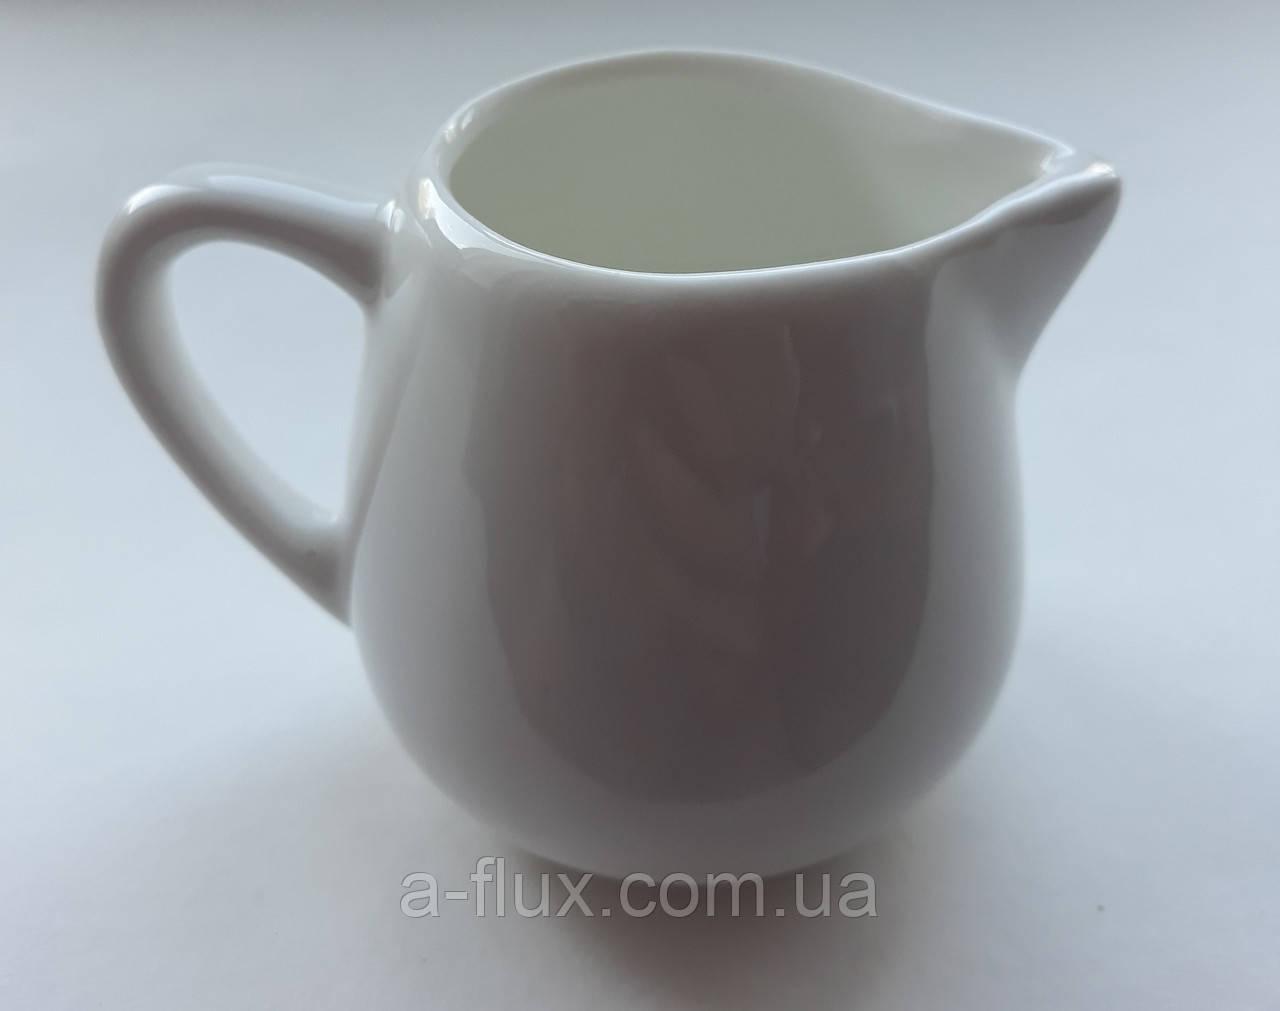 Молочник 80 мл фарфор белье Китай 0263Б